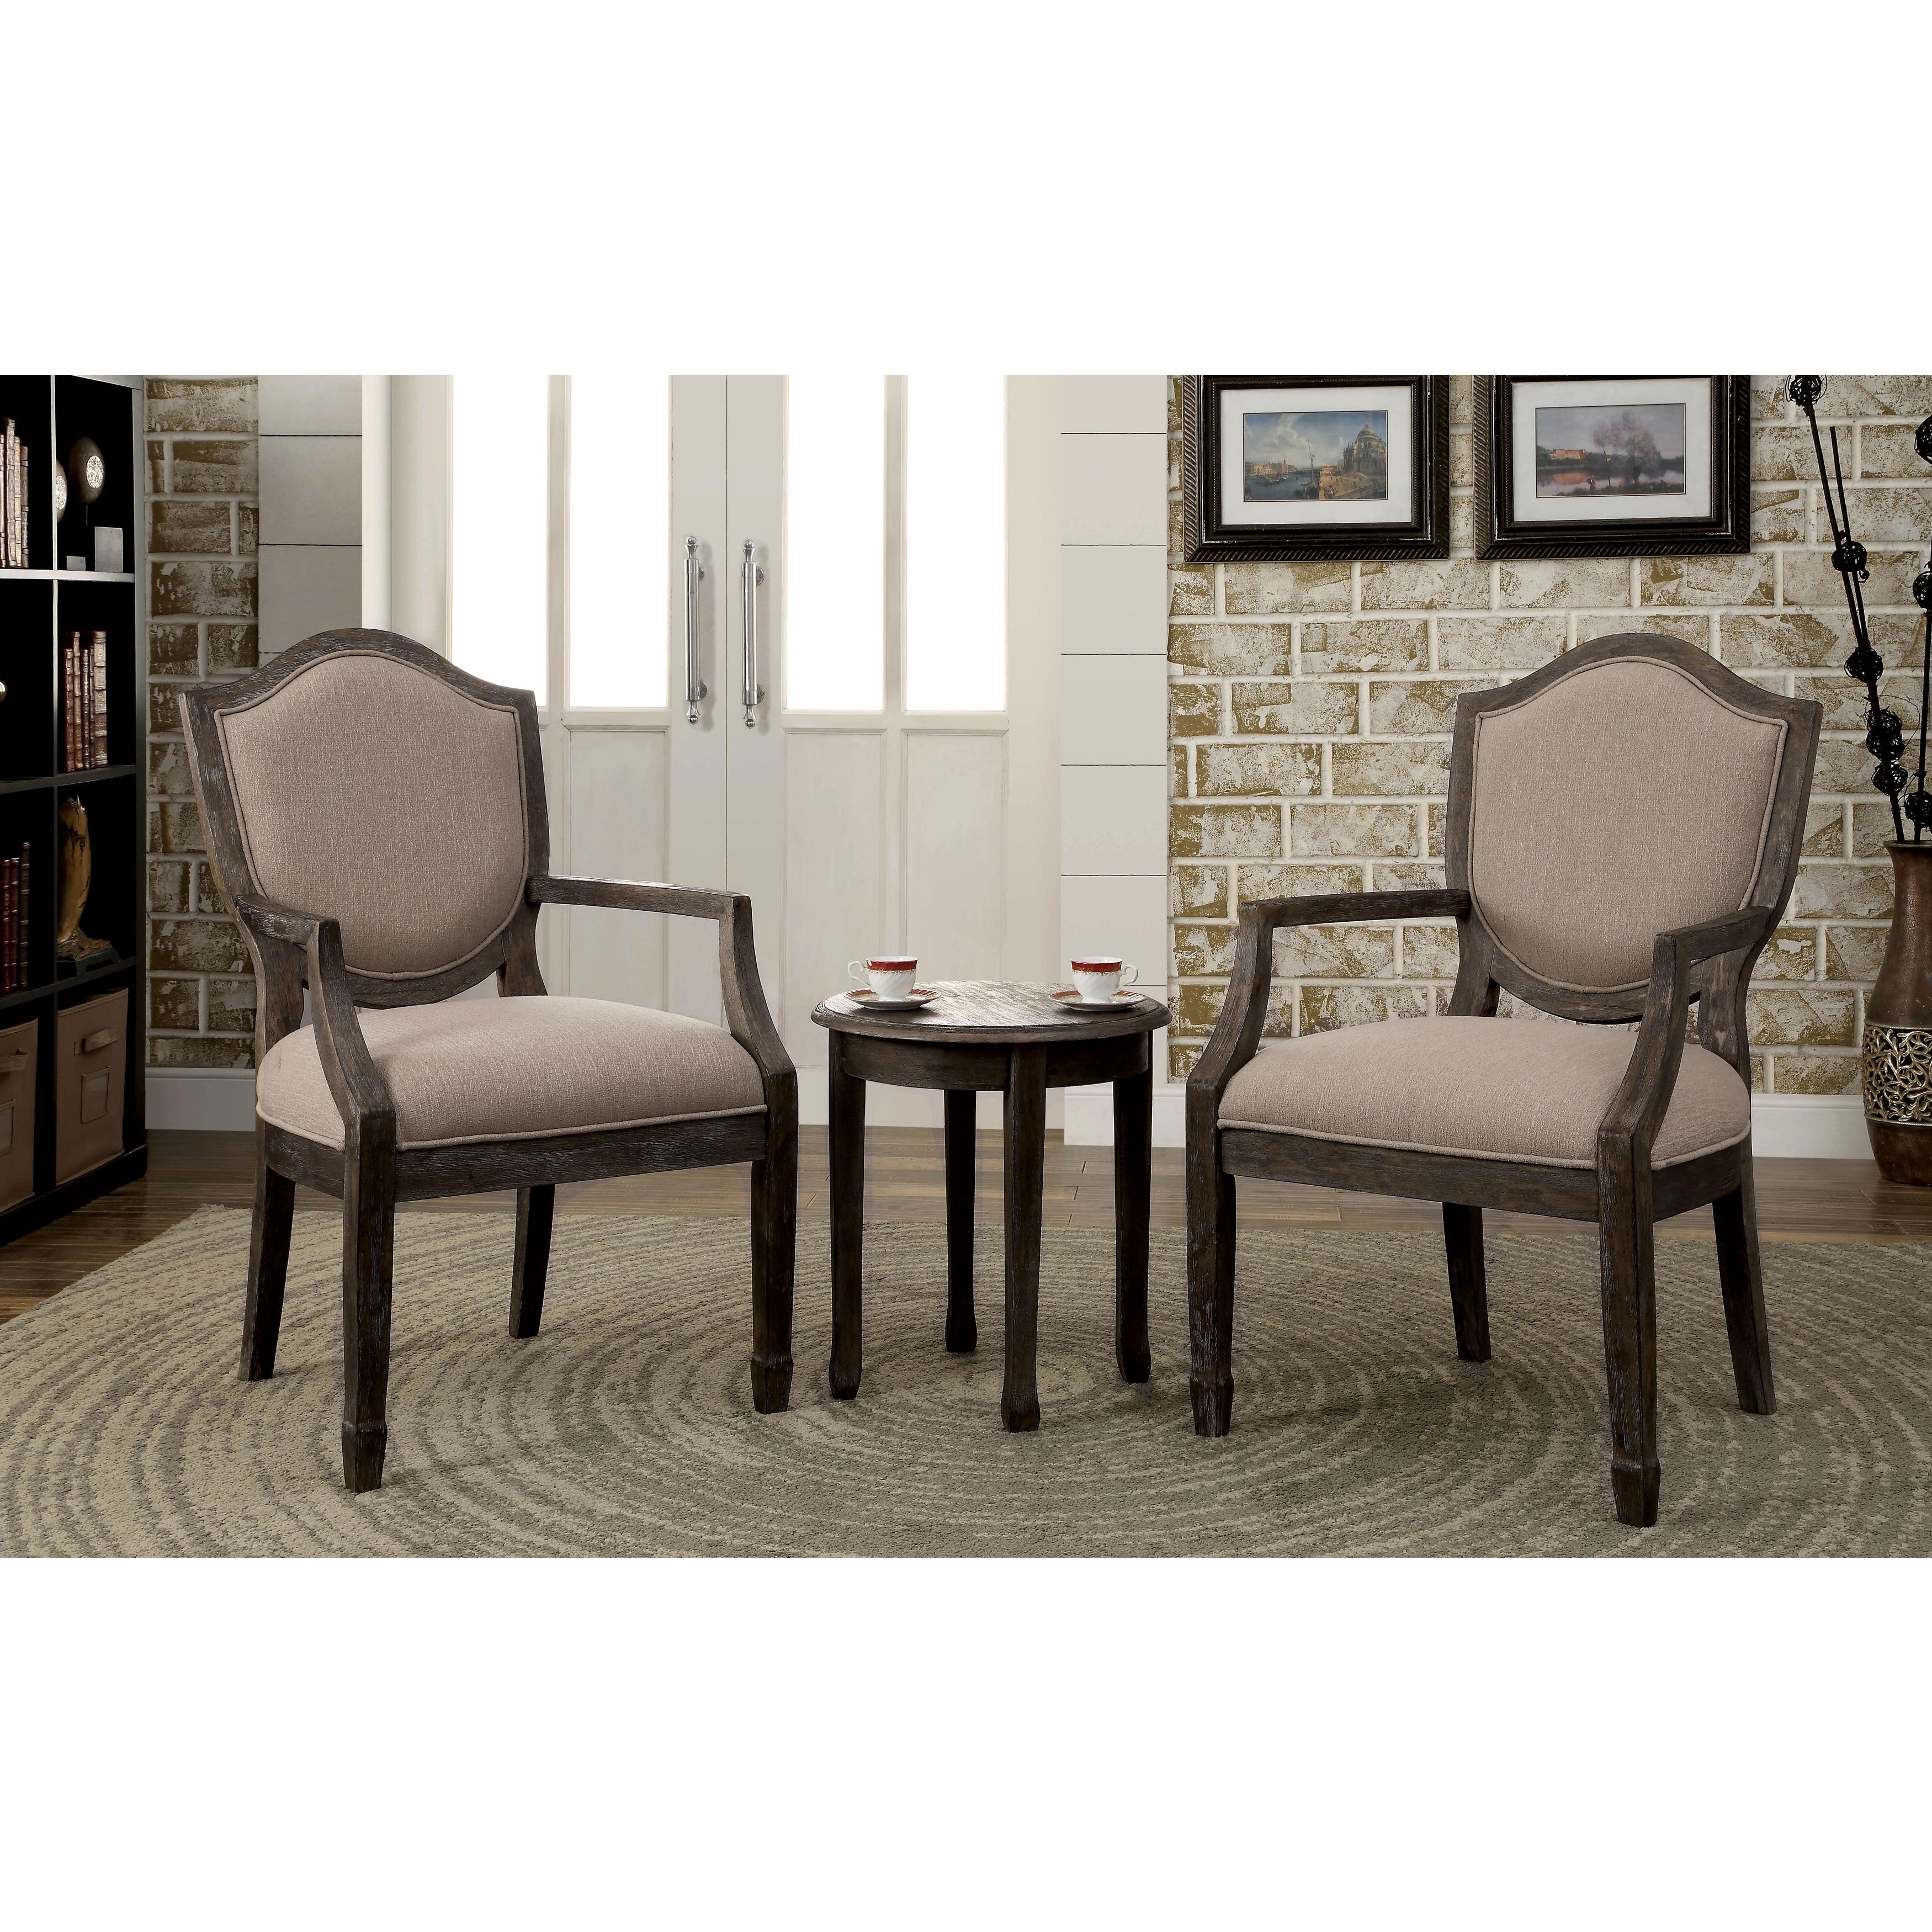 Furniture of america caroline 3 piece living room furniture set